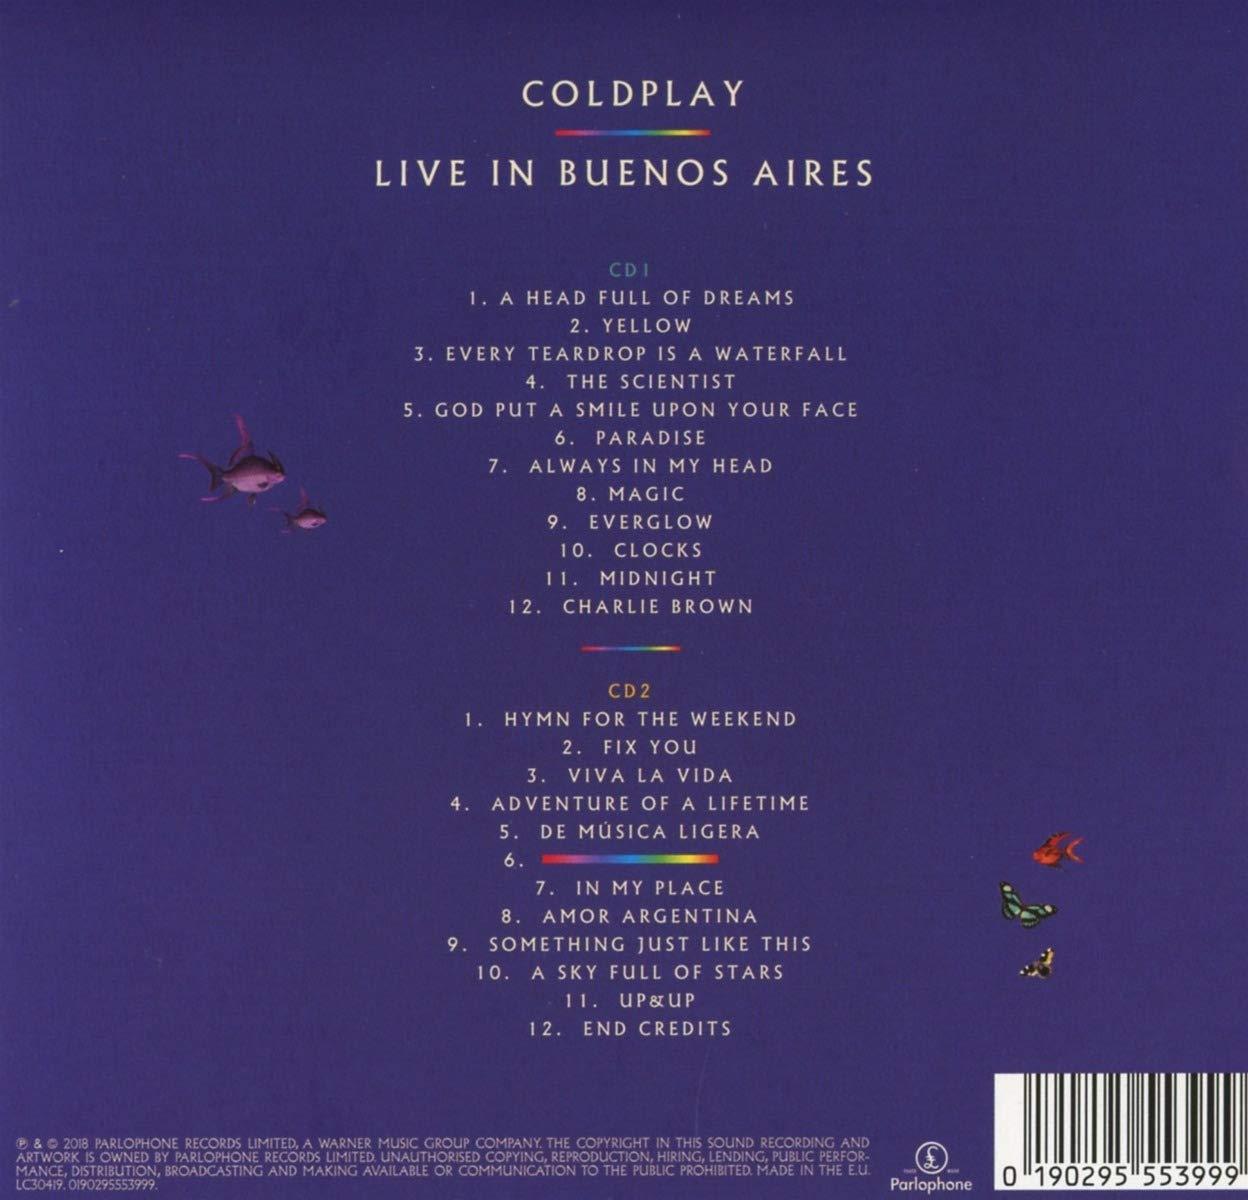 Live In Buenos Aires: Coldplay, Coldplay: Amazon.es: Música